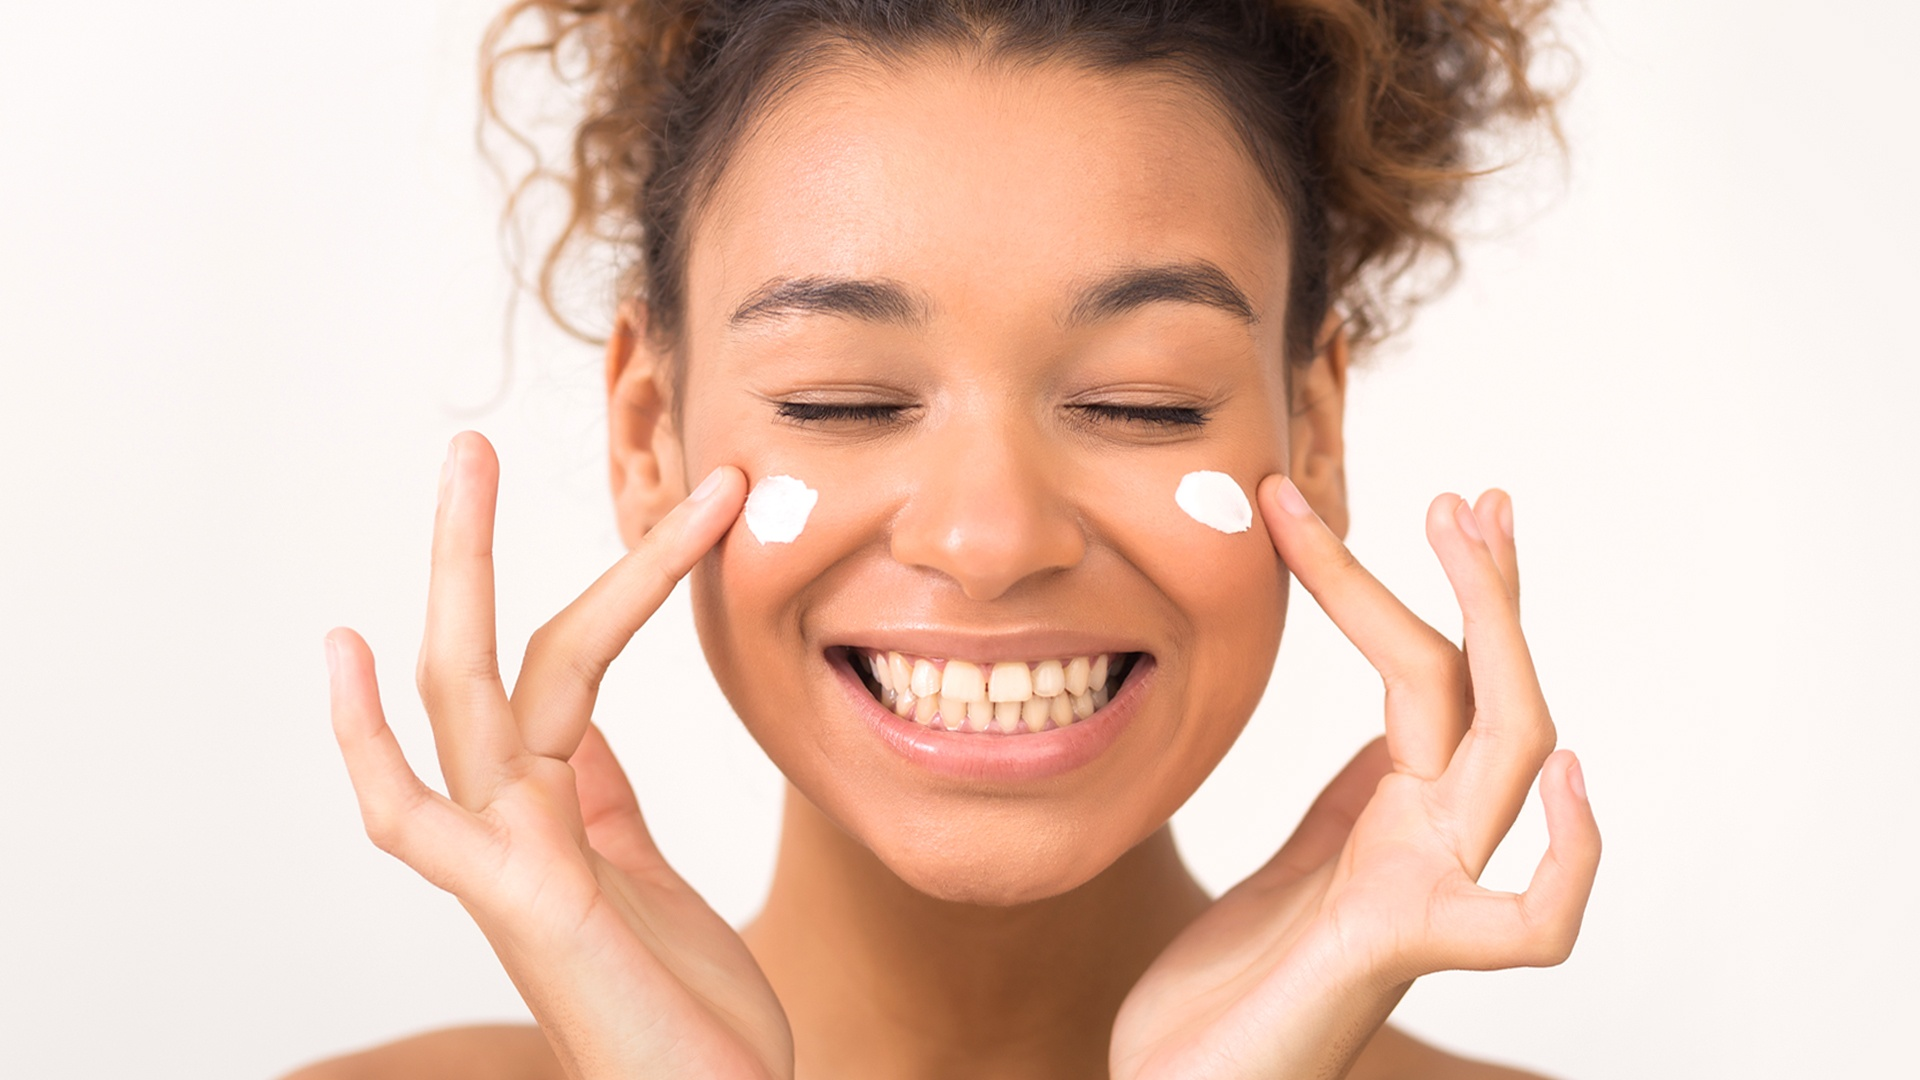 Nos produits Happy Beauty Visage   Maquillage   Onglerie   Minceur   Coiffure